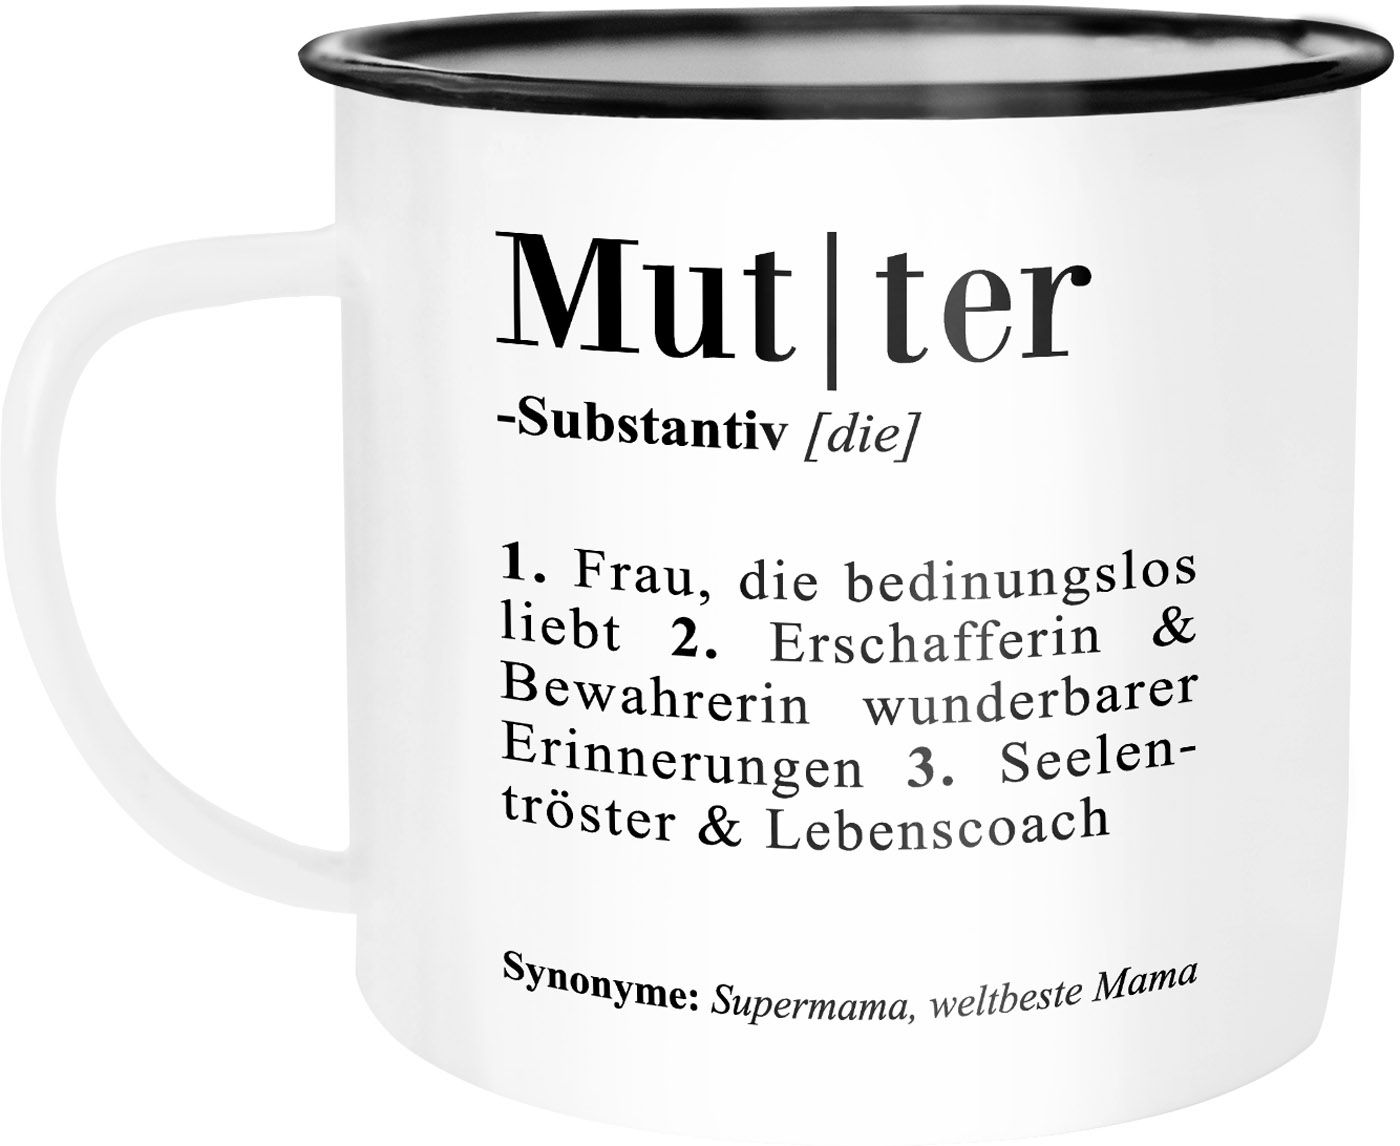 Emaille Tasse Becher Mama Definiation Worterbuch Dictionary Duden